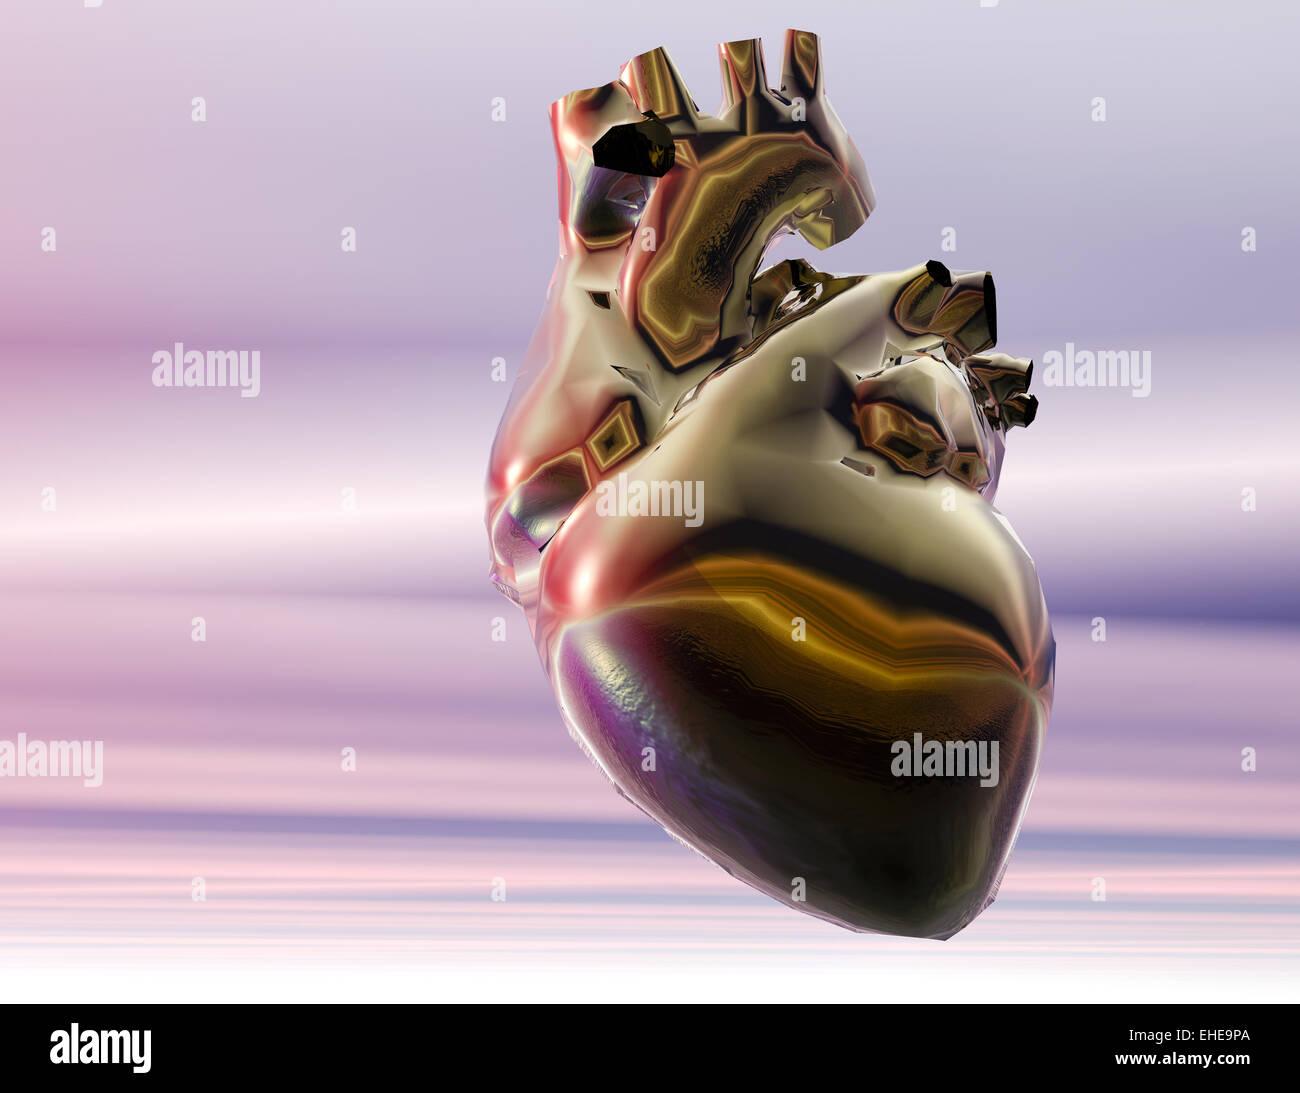 Herz Anatomie Pumpe Stock Photos & Herz Anatomie Pumpe Stock Images ...